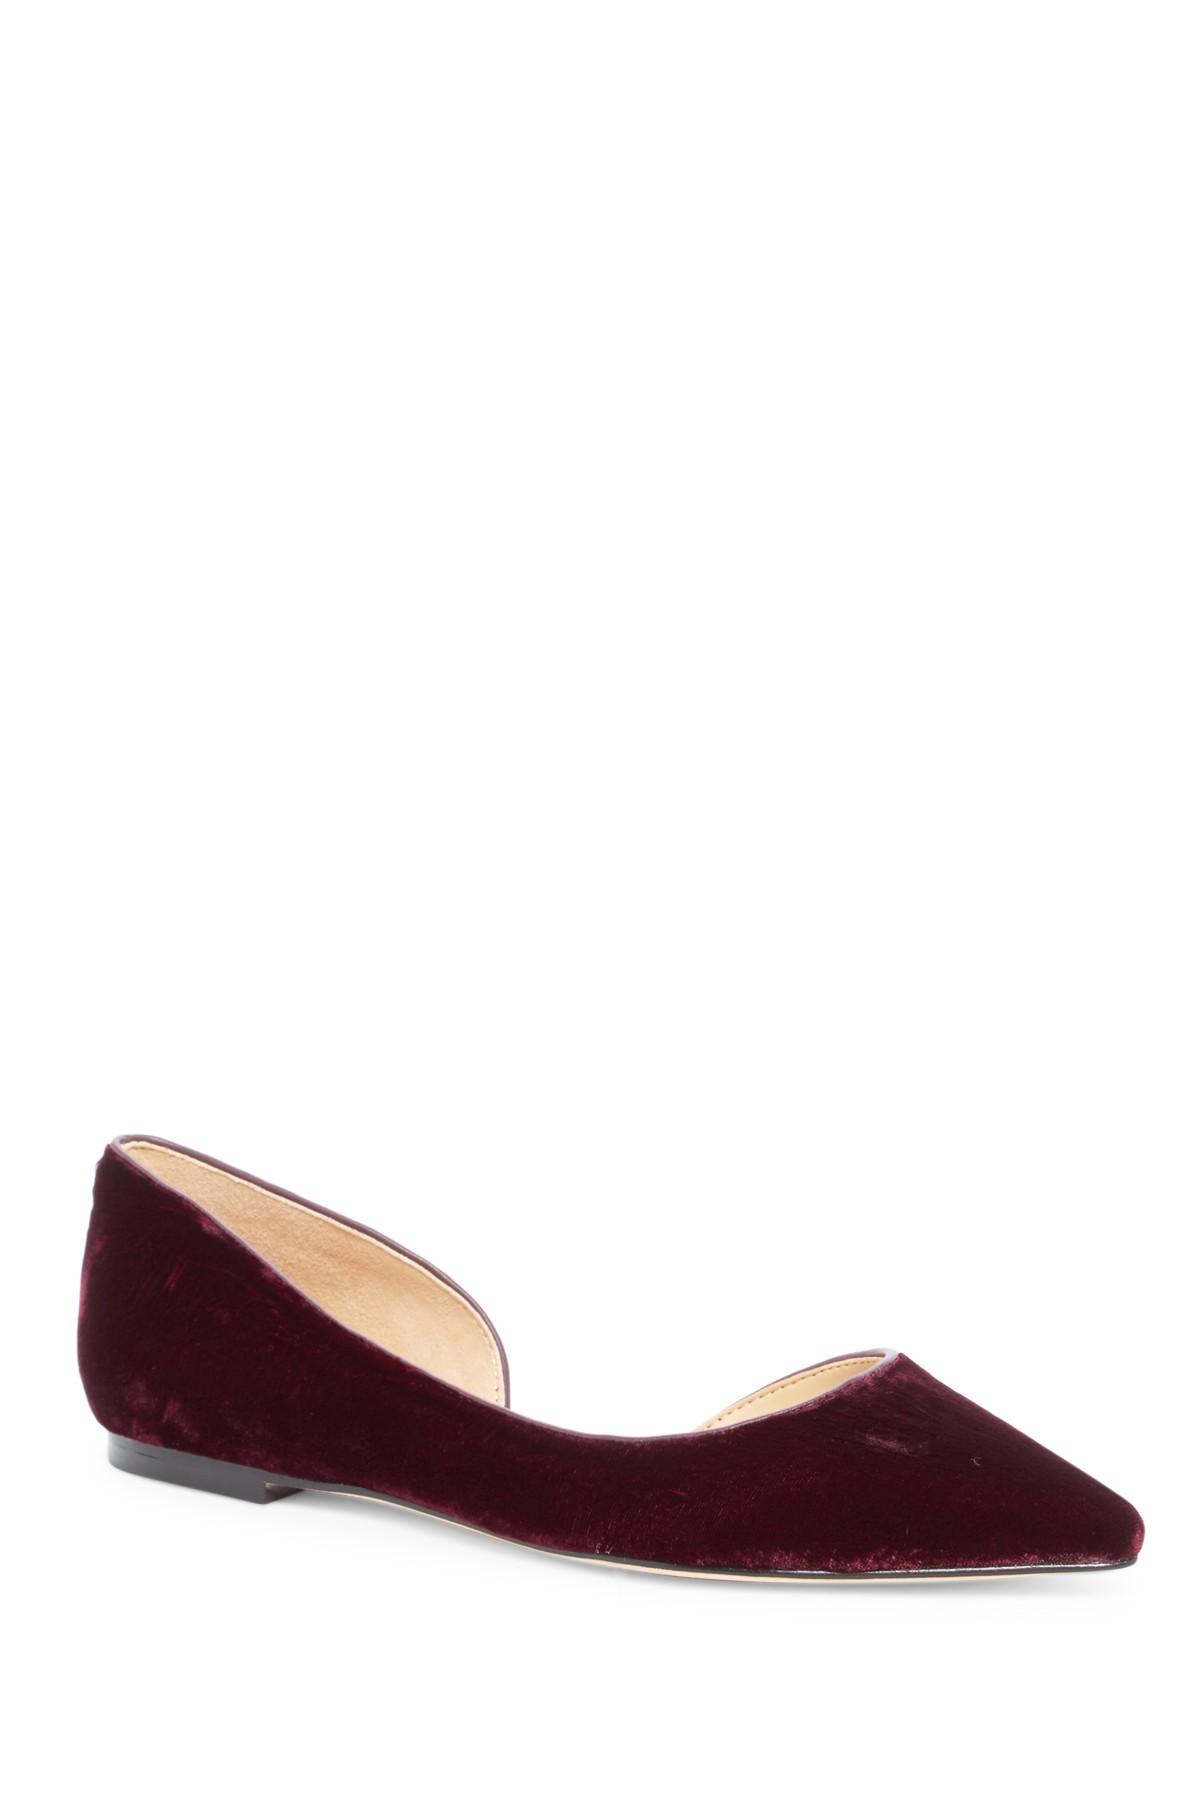 women Sam Edelman Reema shoes Plates